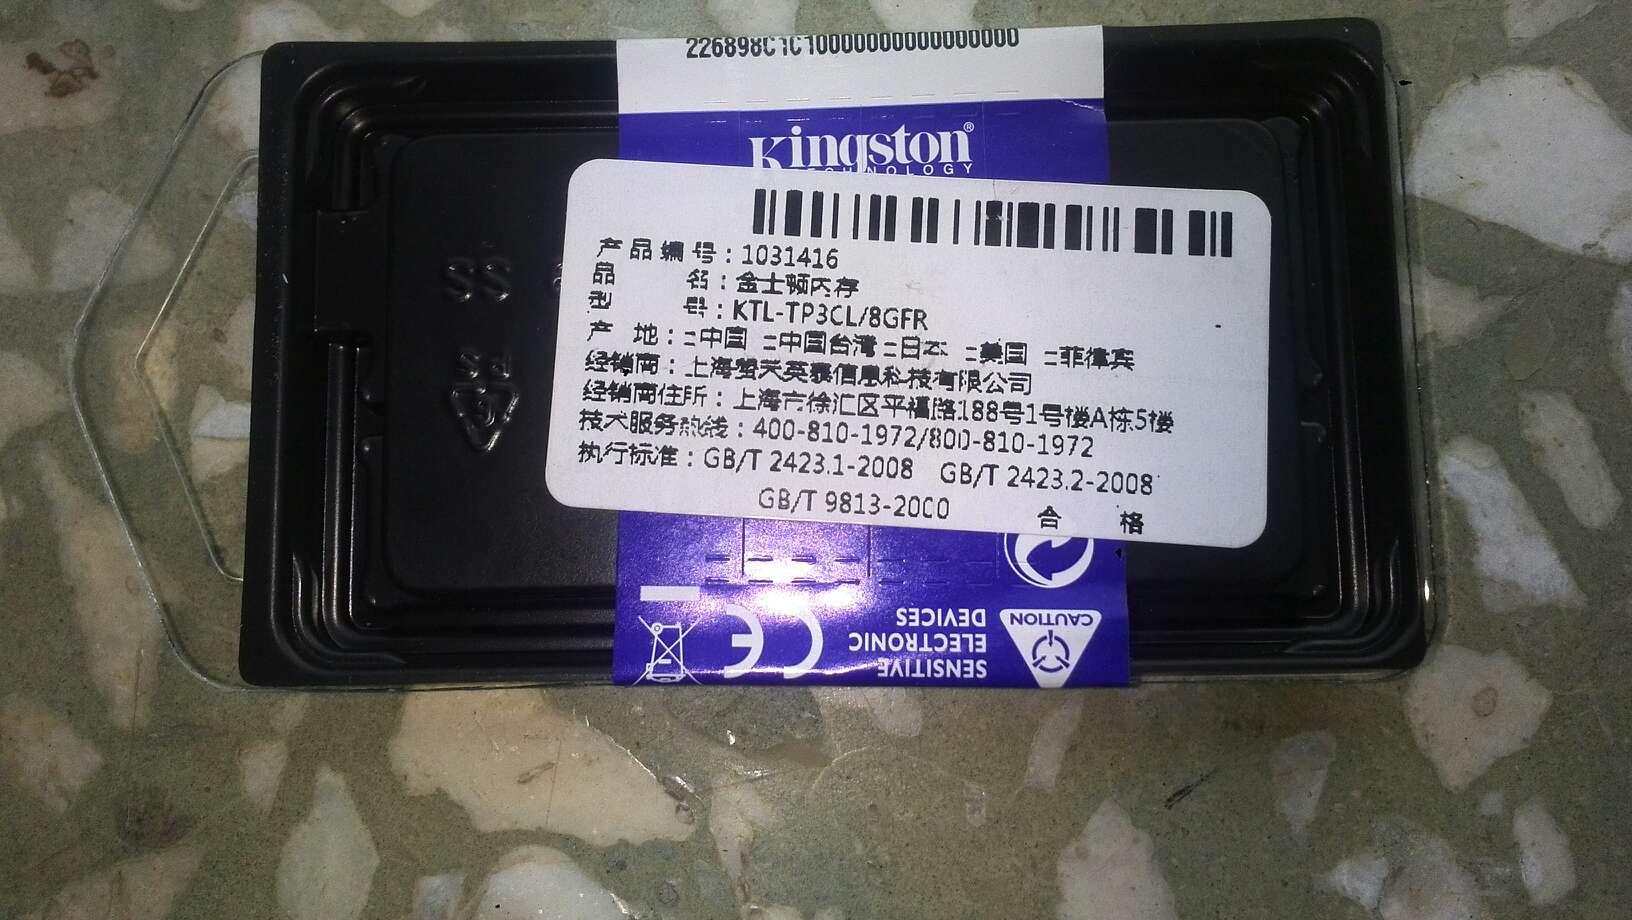 air max 110s jd 00967143 cheapestonline